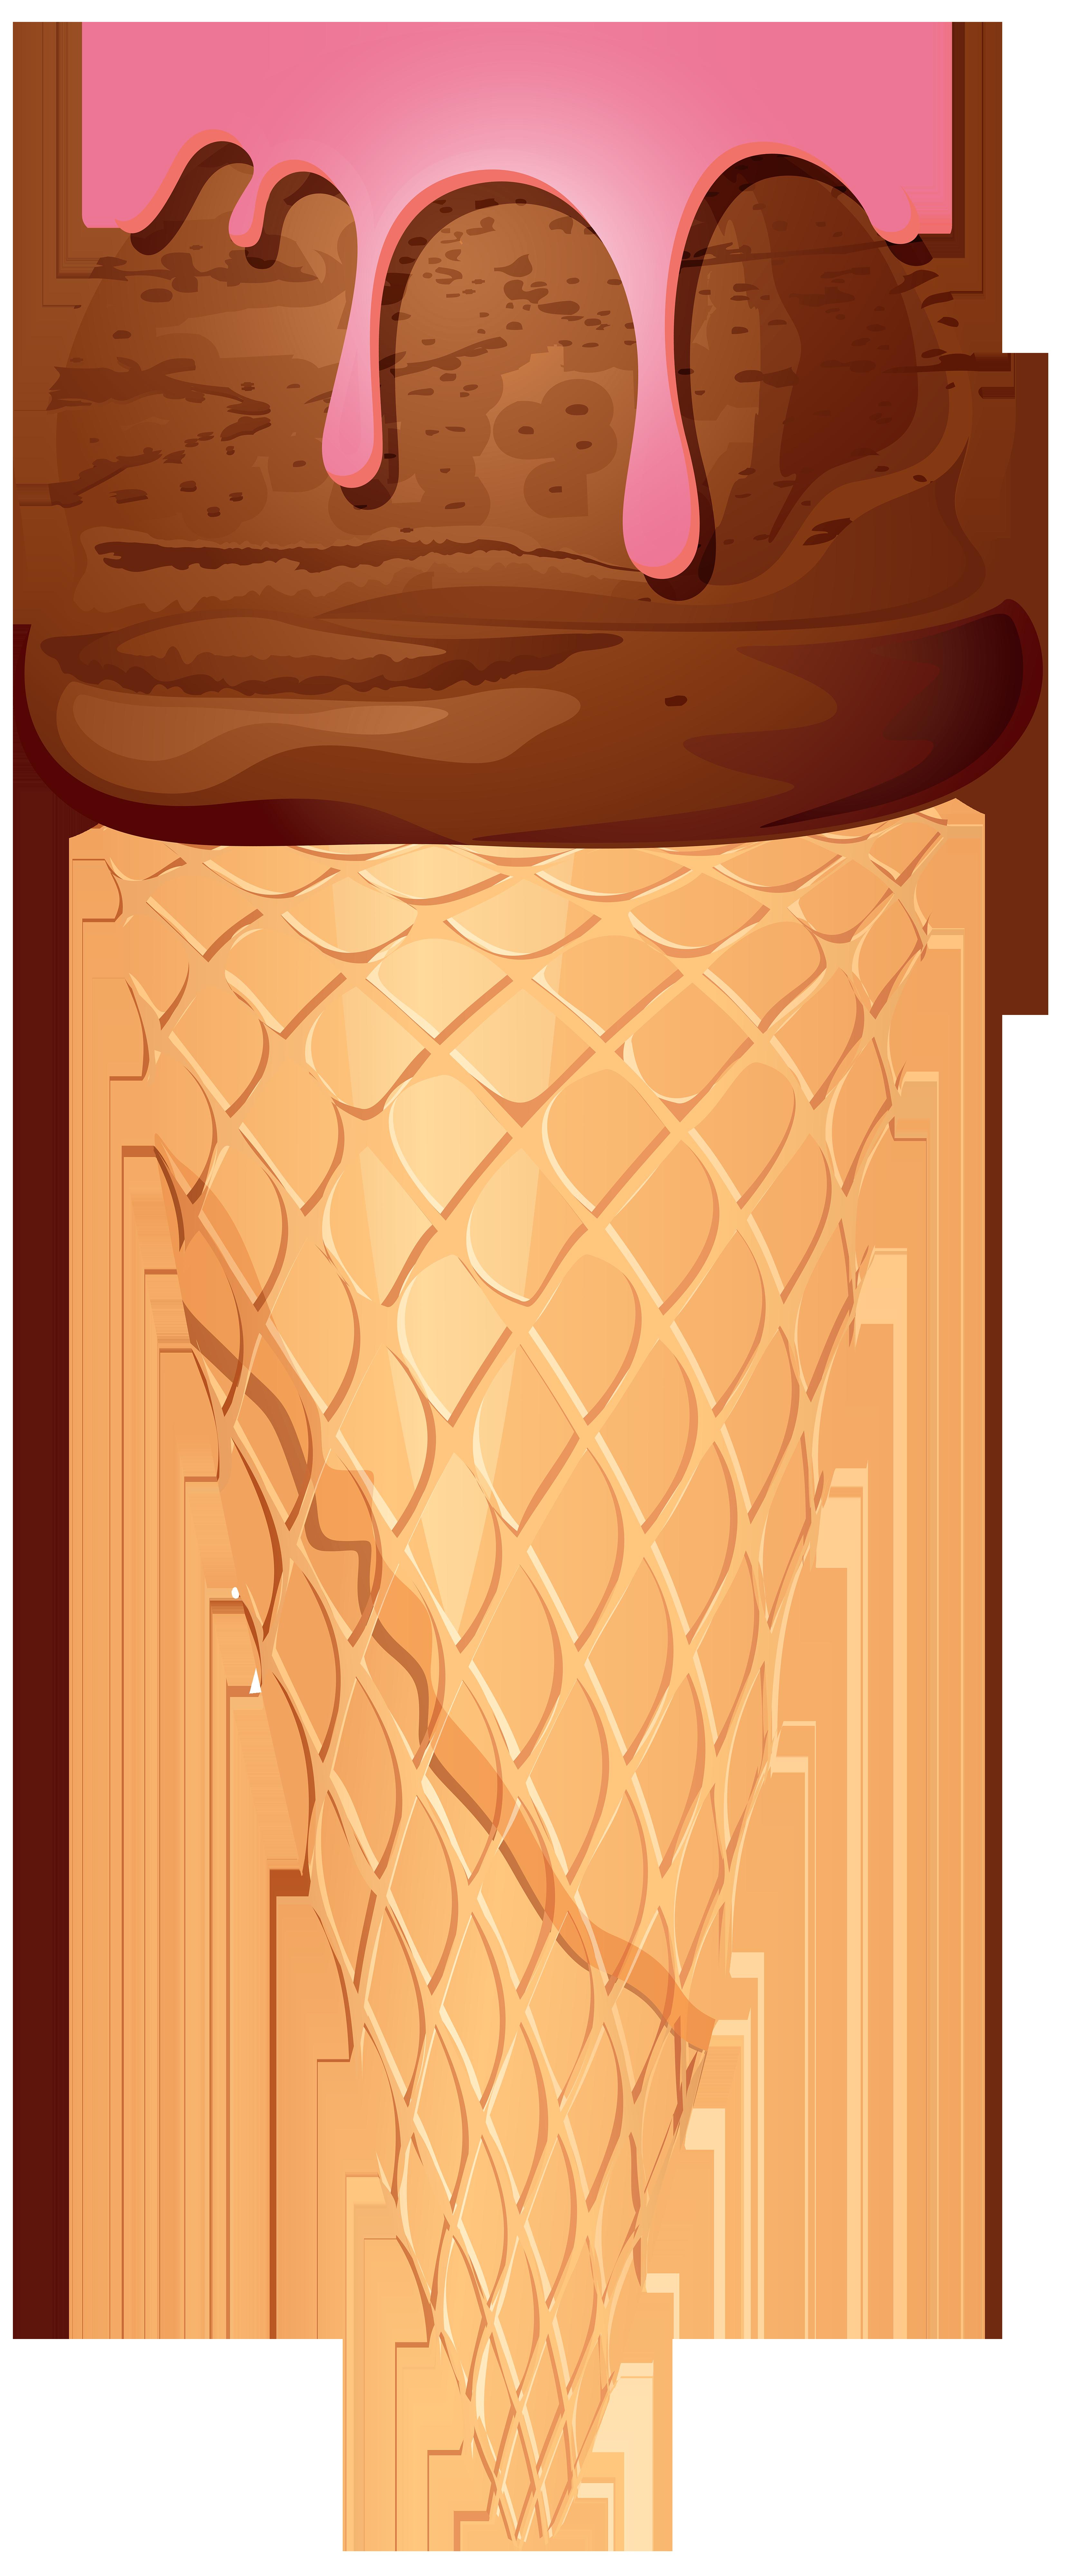 Ice cream cone png. Icecream clipart chocolate